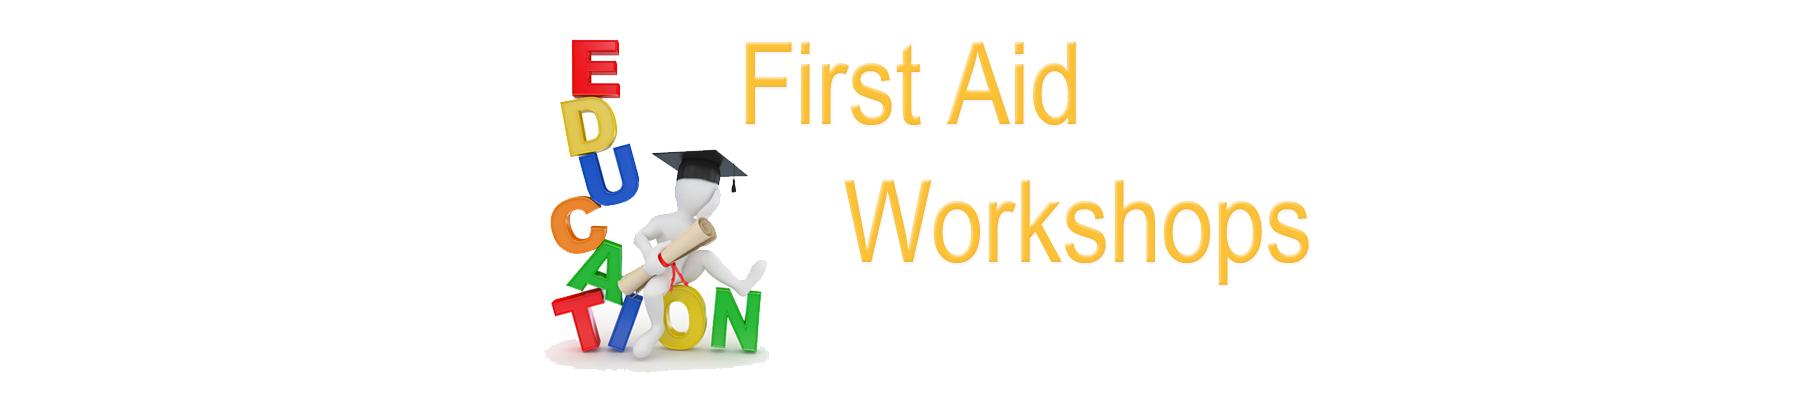 Book a First Aid Training Workshop